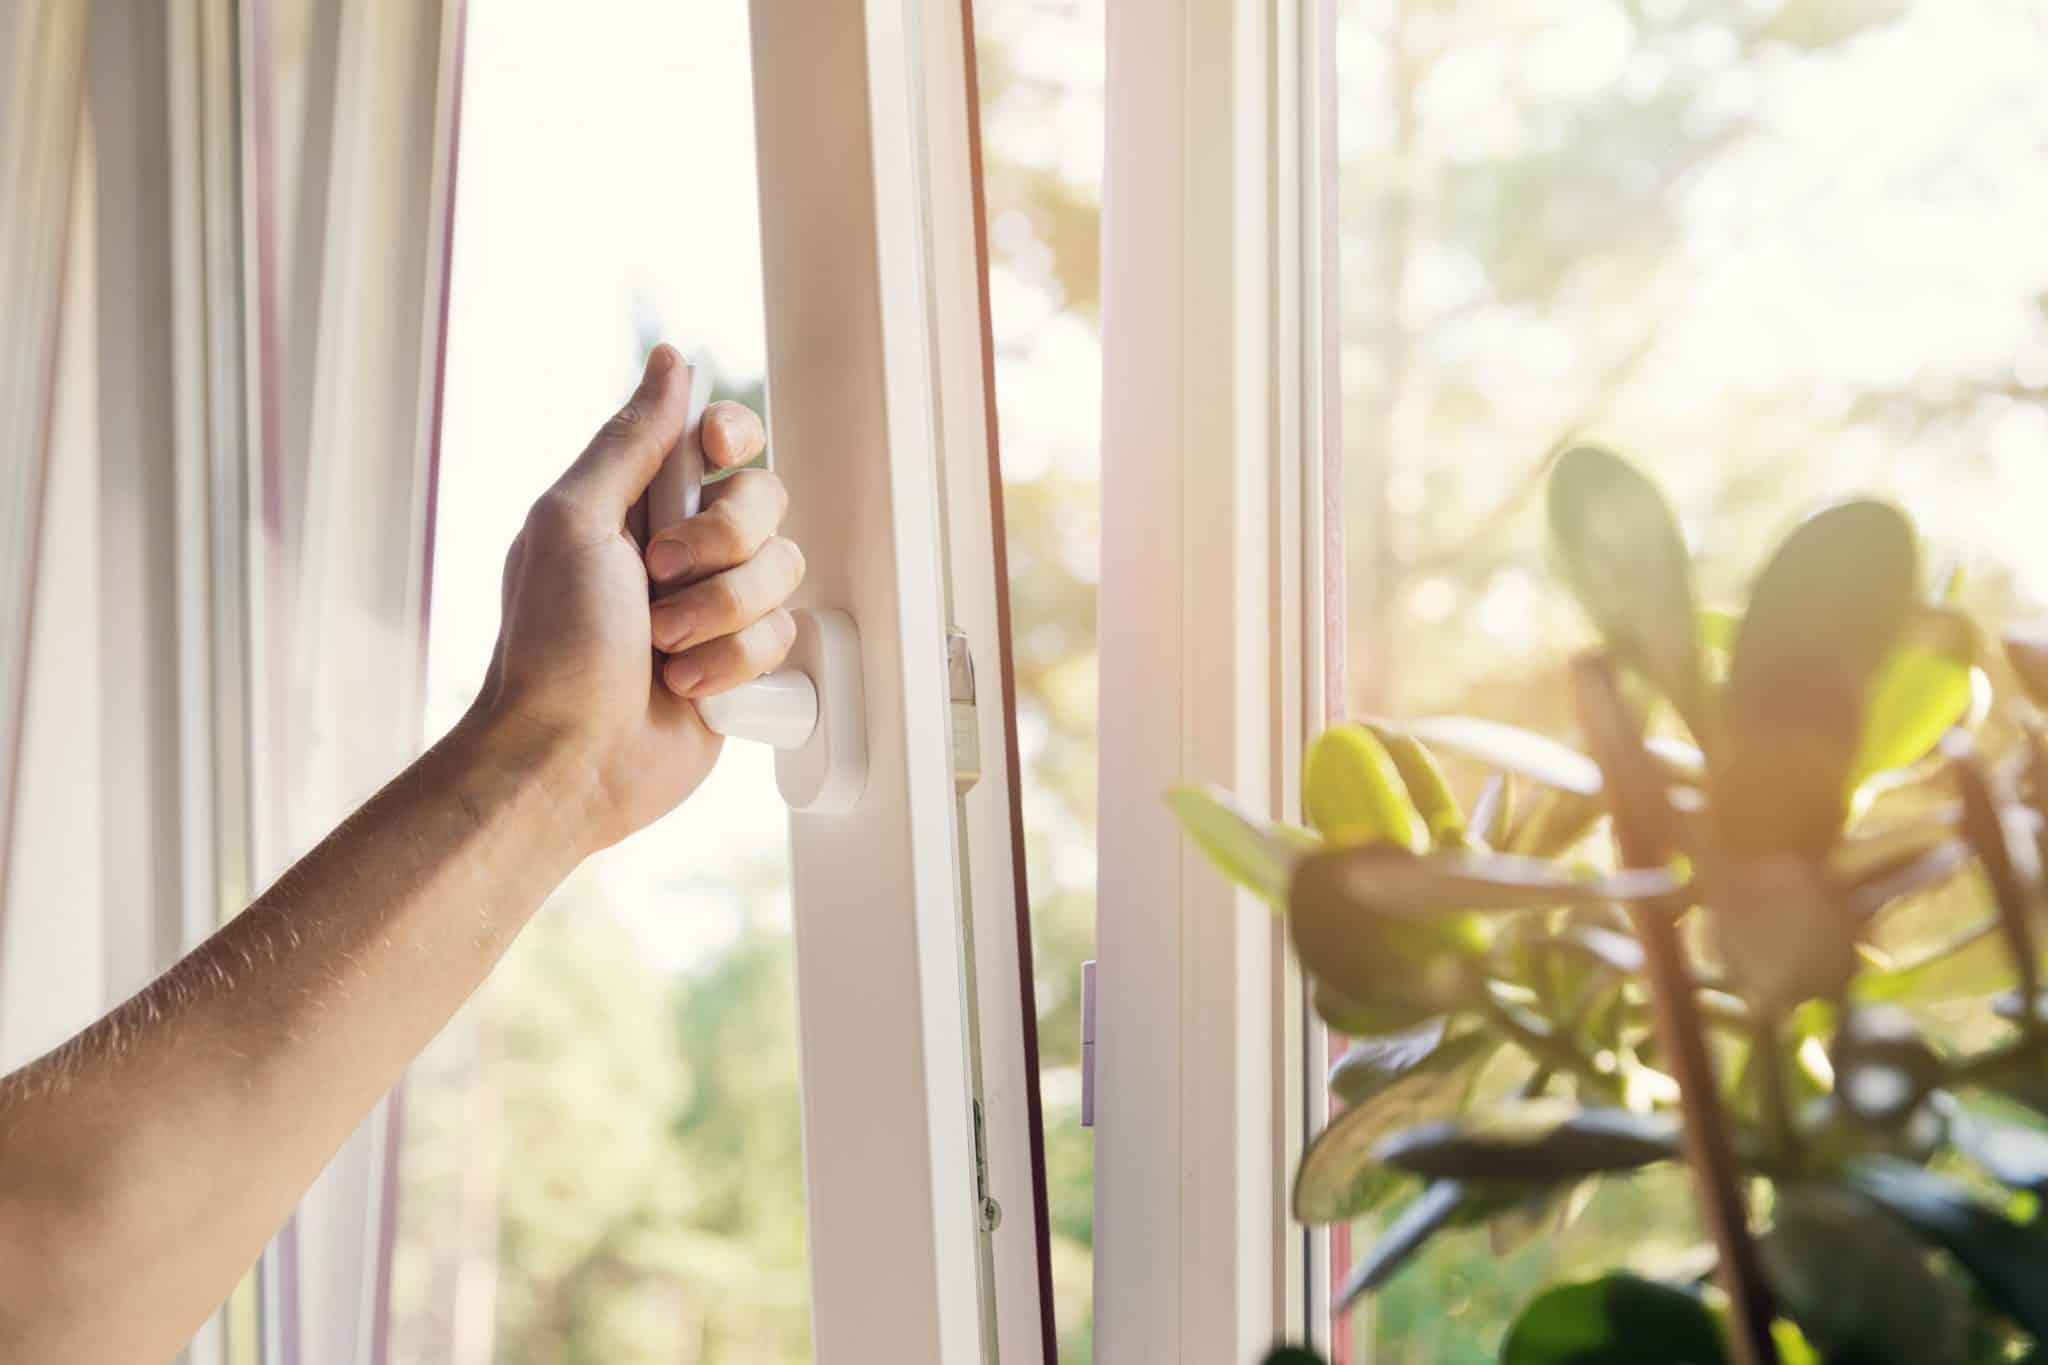 opening-window-c4u-kelowna-home-inspection